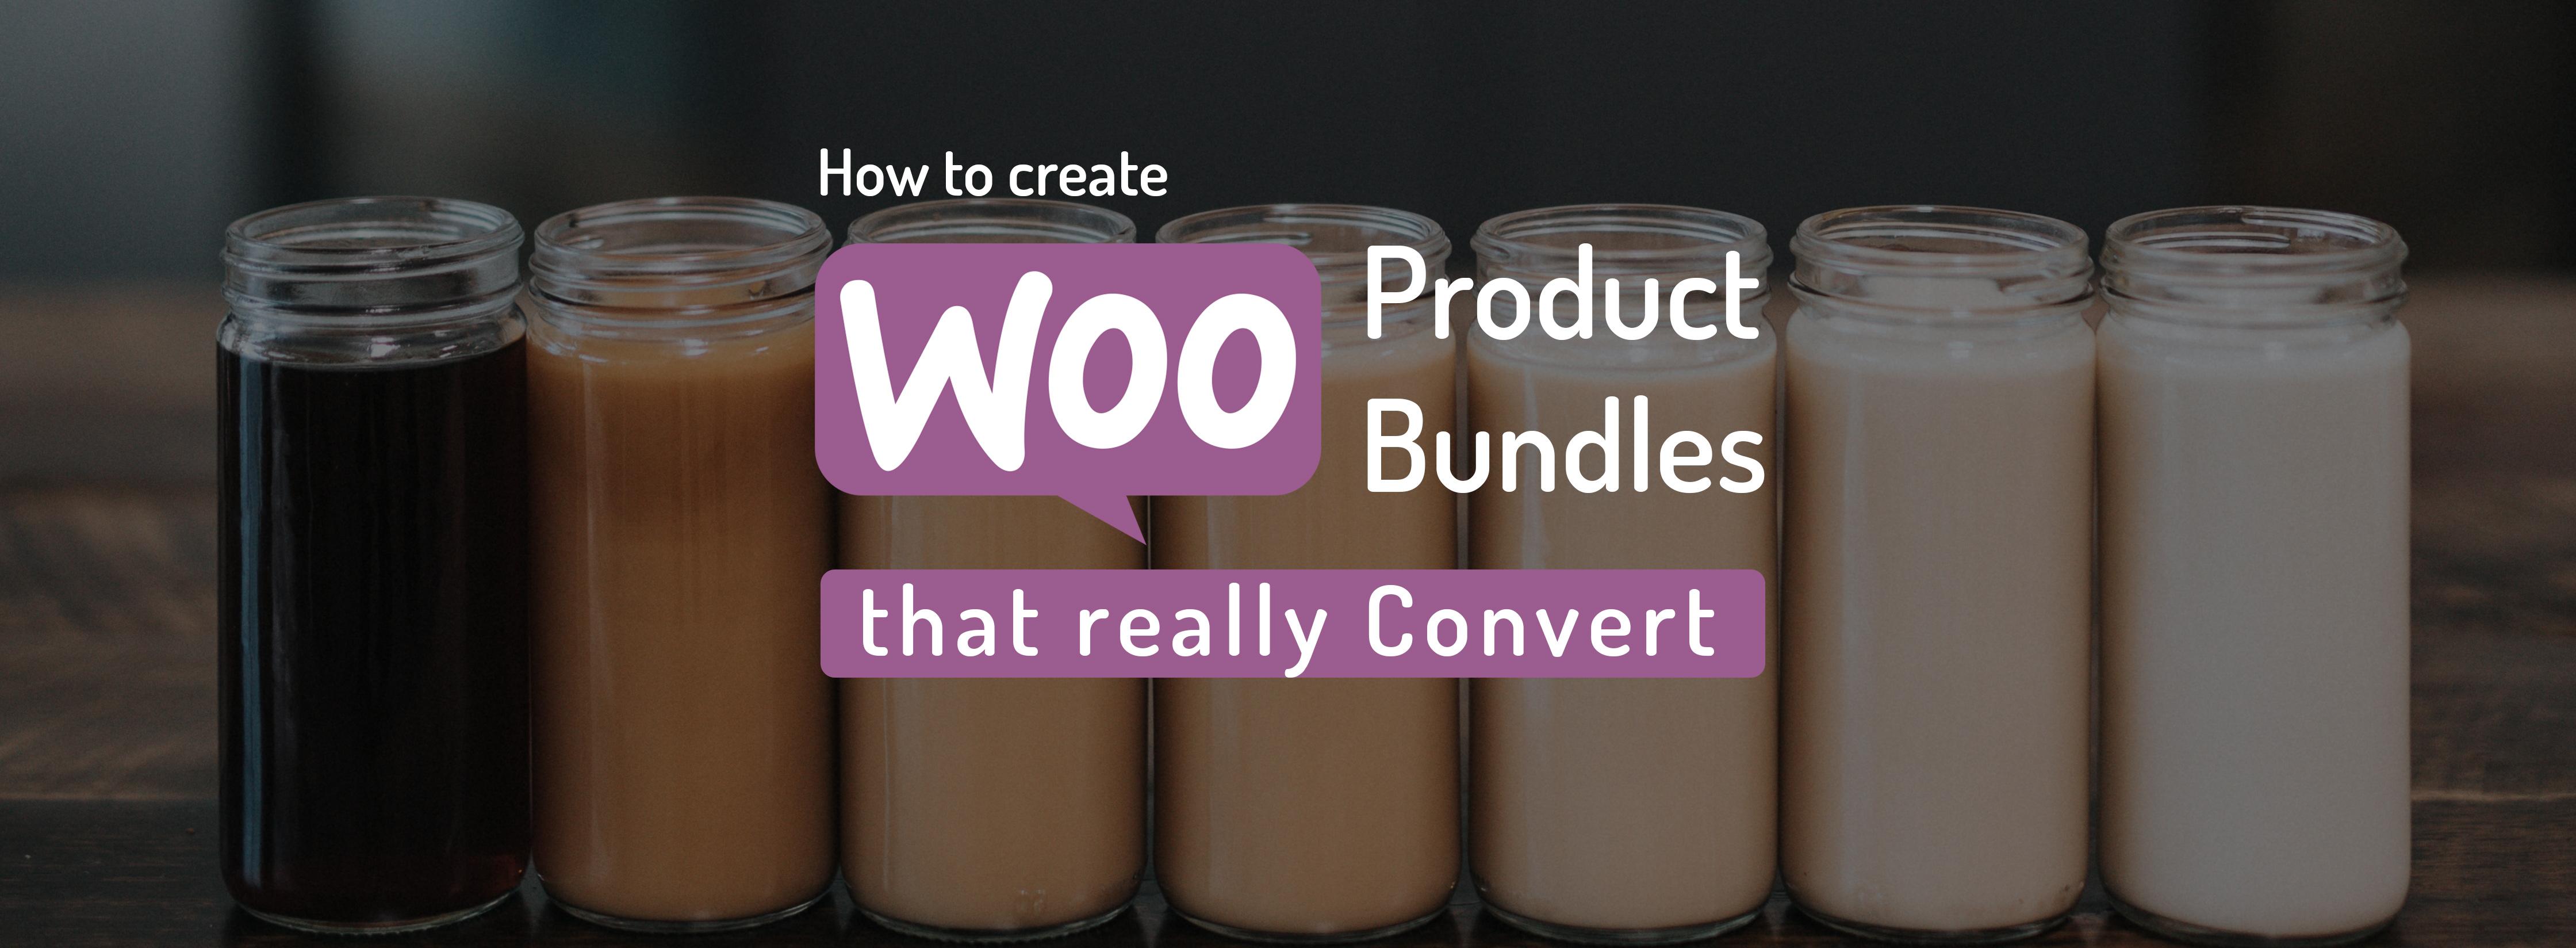 WooCommerce product bundles